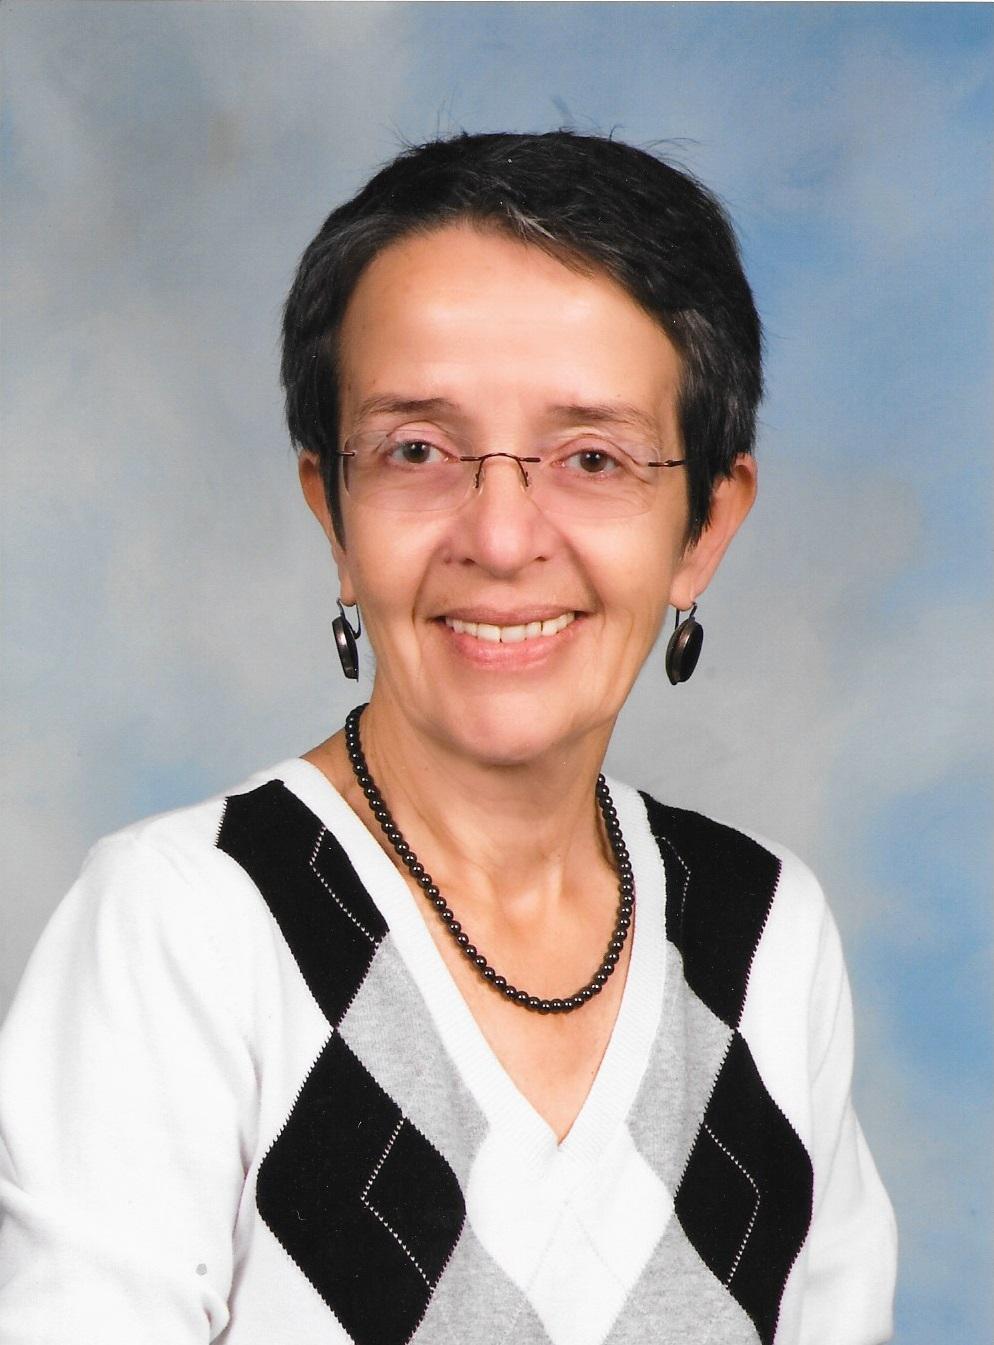 Julia Turchaninova